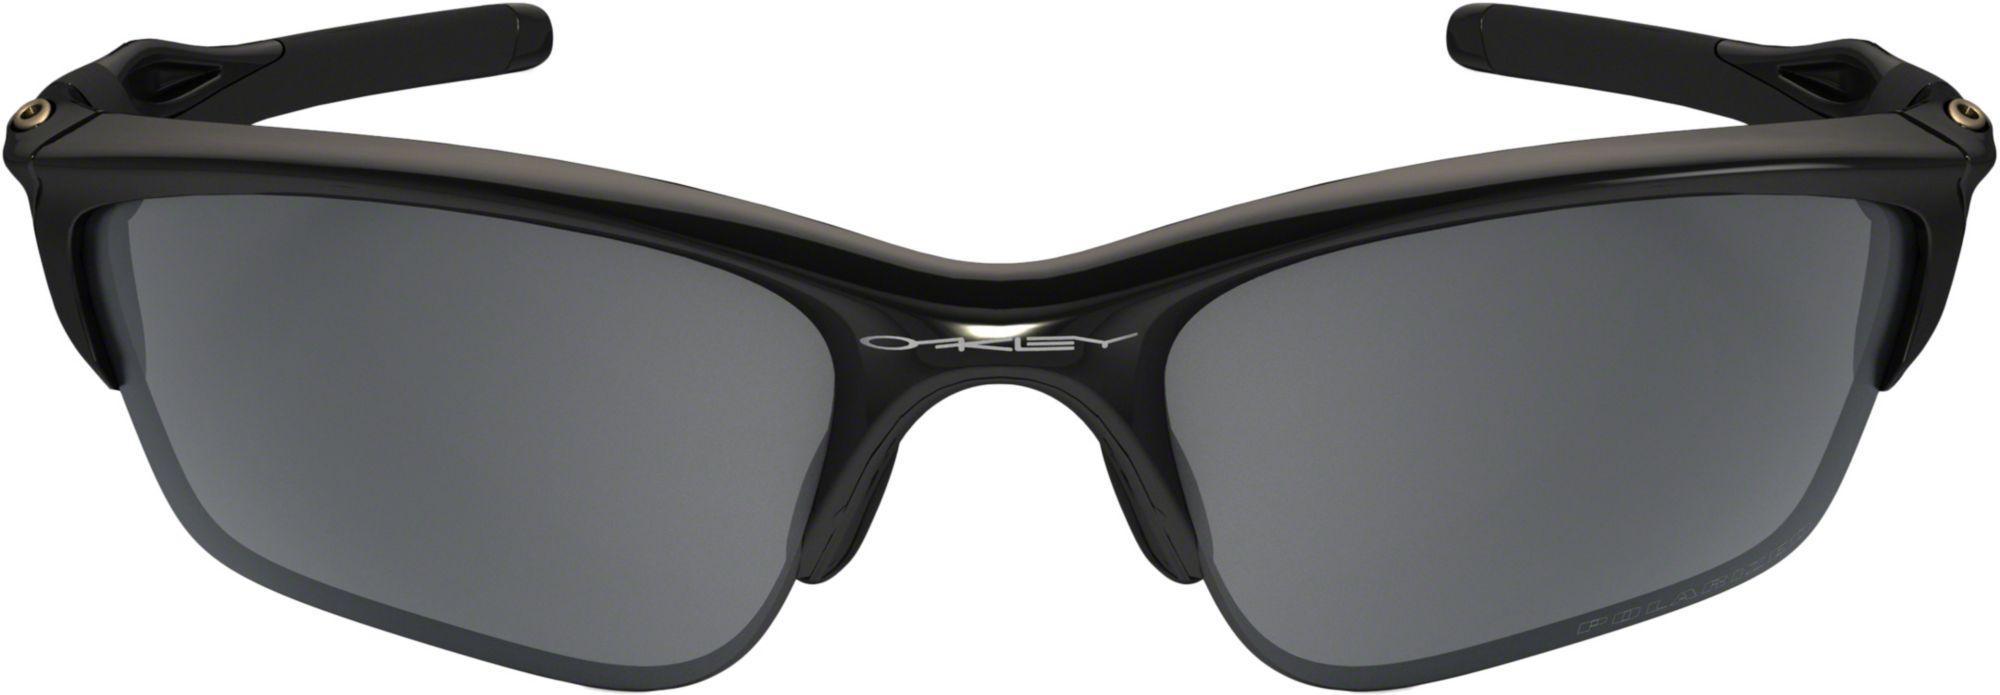 c60a5f6fe41 Lyst - Oakley Half Jacket 2.0 Polarized Sunglasses in Black for Men